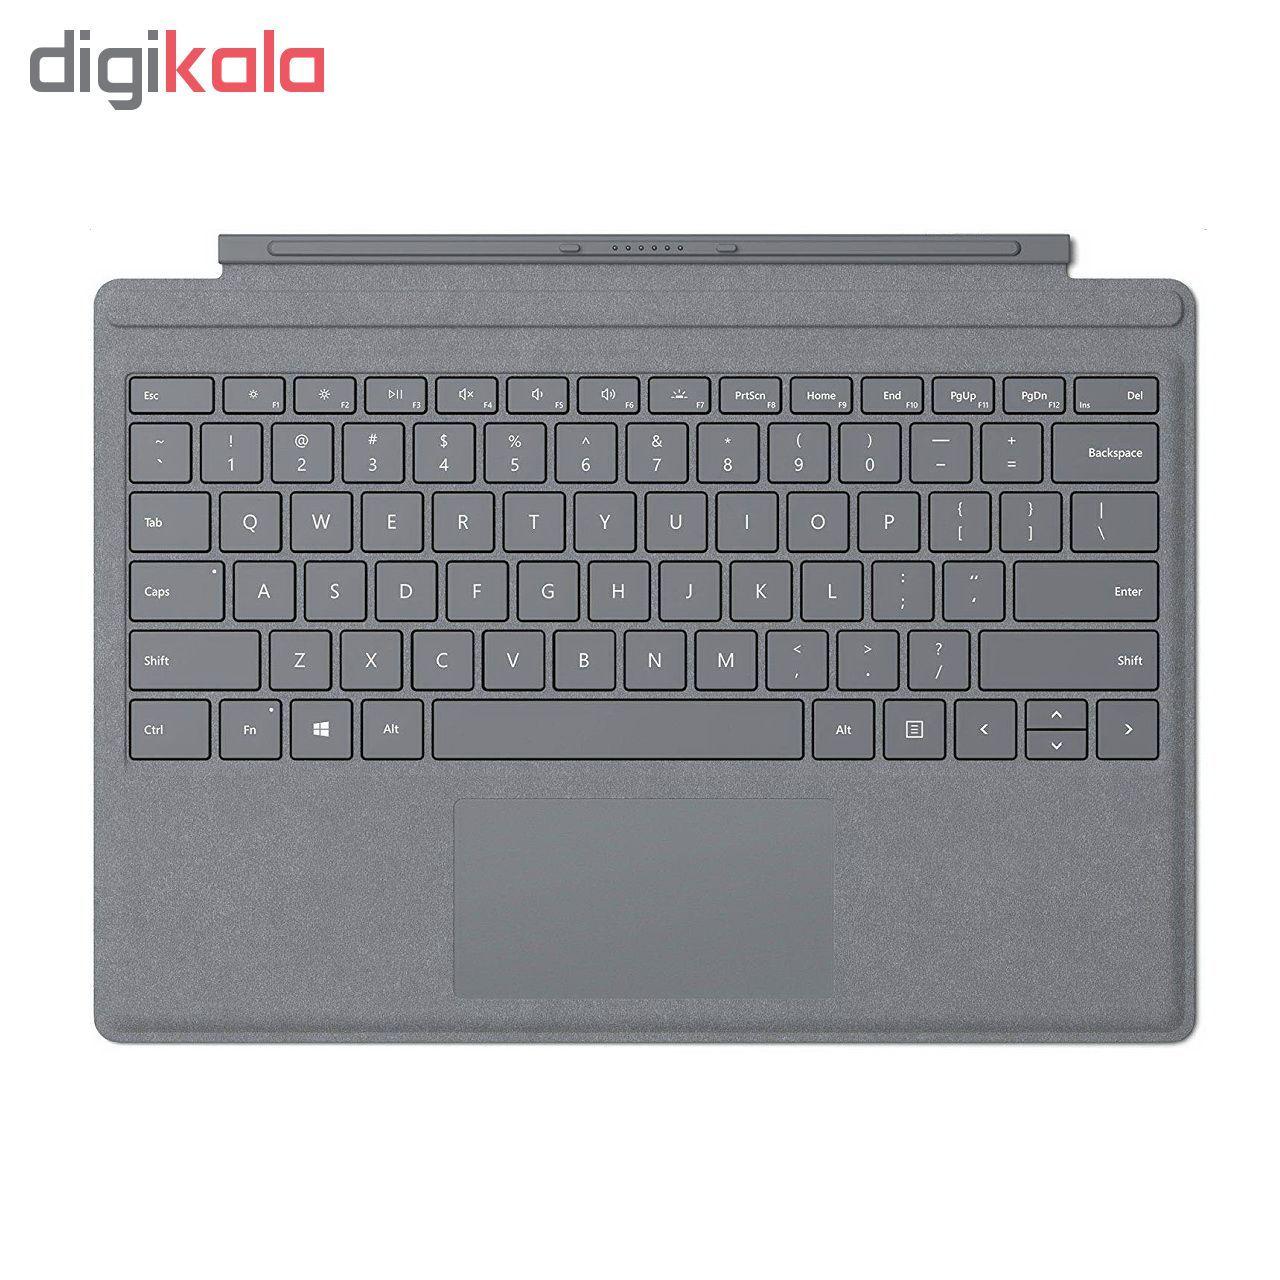 تبلت مایکروسافت مدل Surface Pro 6 - H به همراه کیبورد Signature و قلم main 1 2